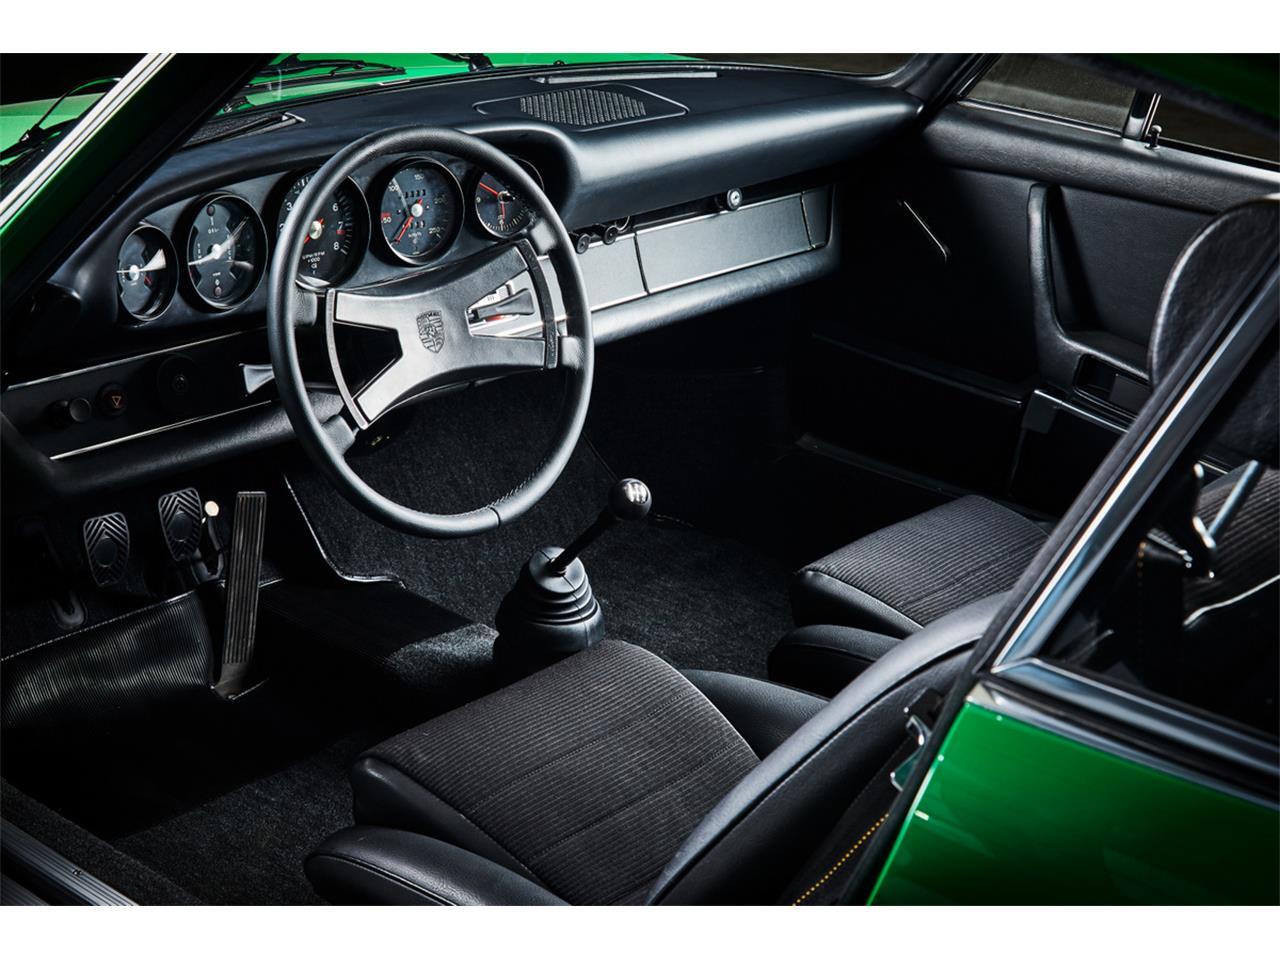 1973 Porsche 911 Carrera (CC-1343359) for sale in Huntington Station, New York